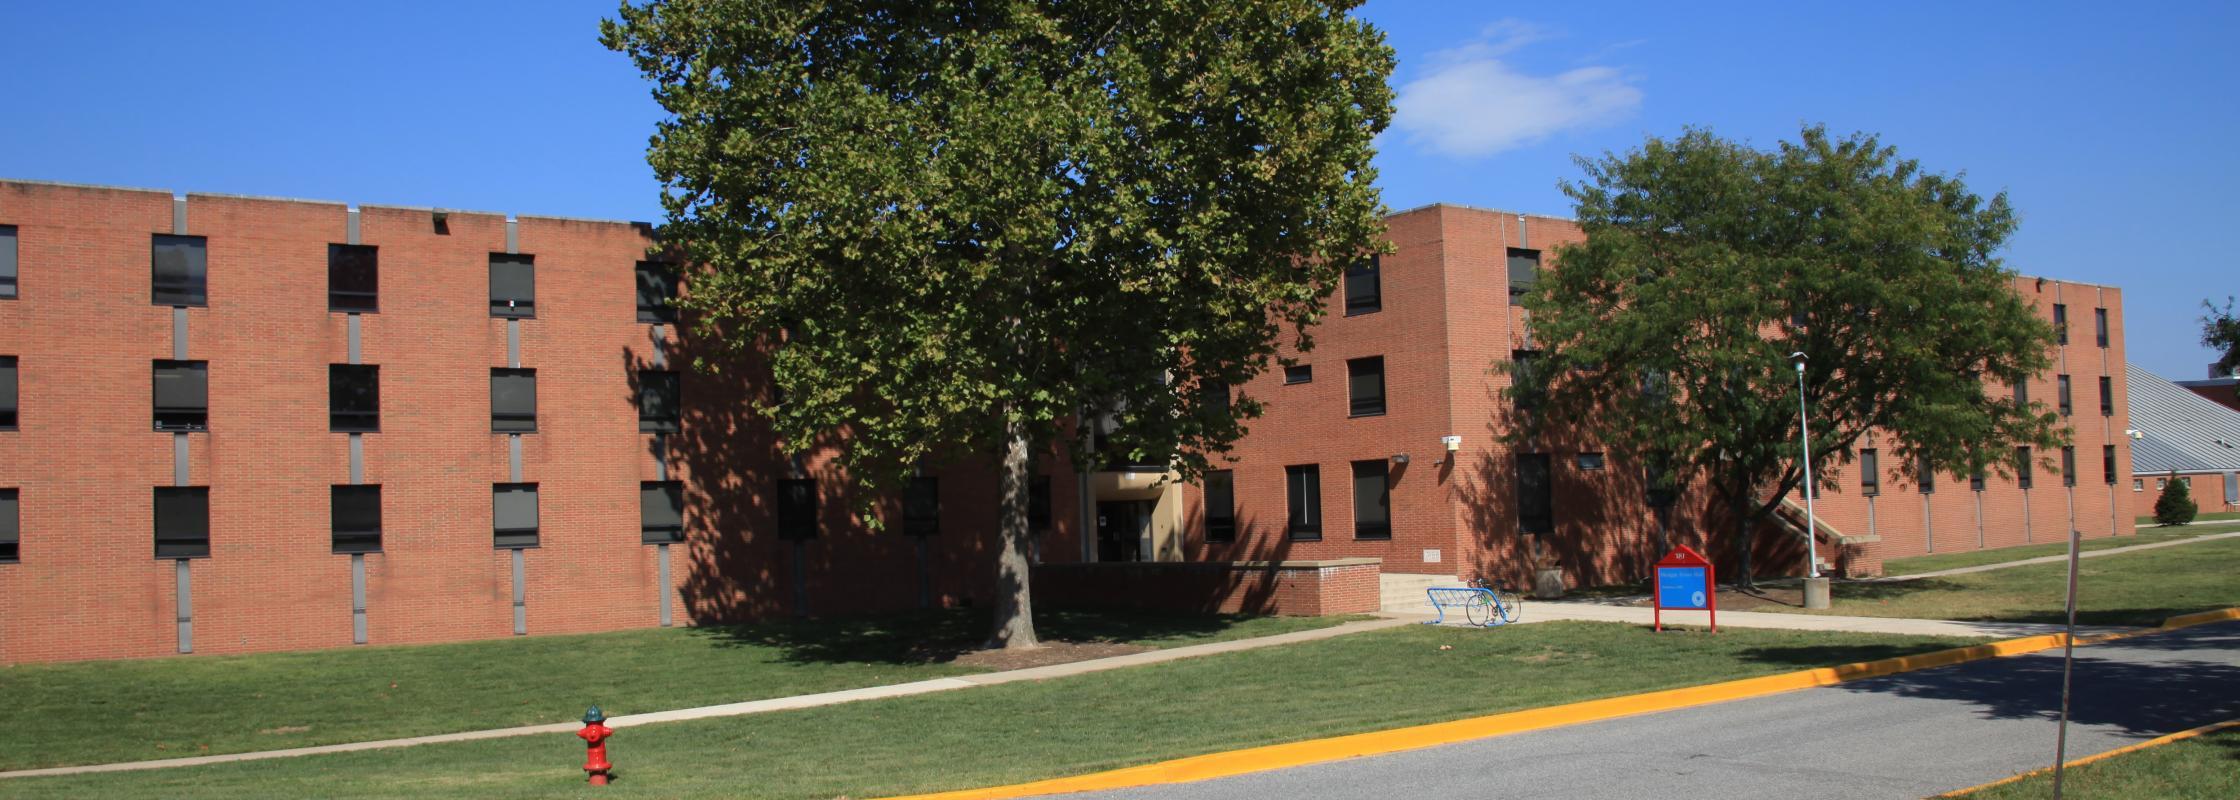 Medgar W. Evers Hall